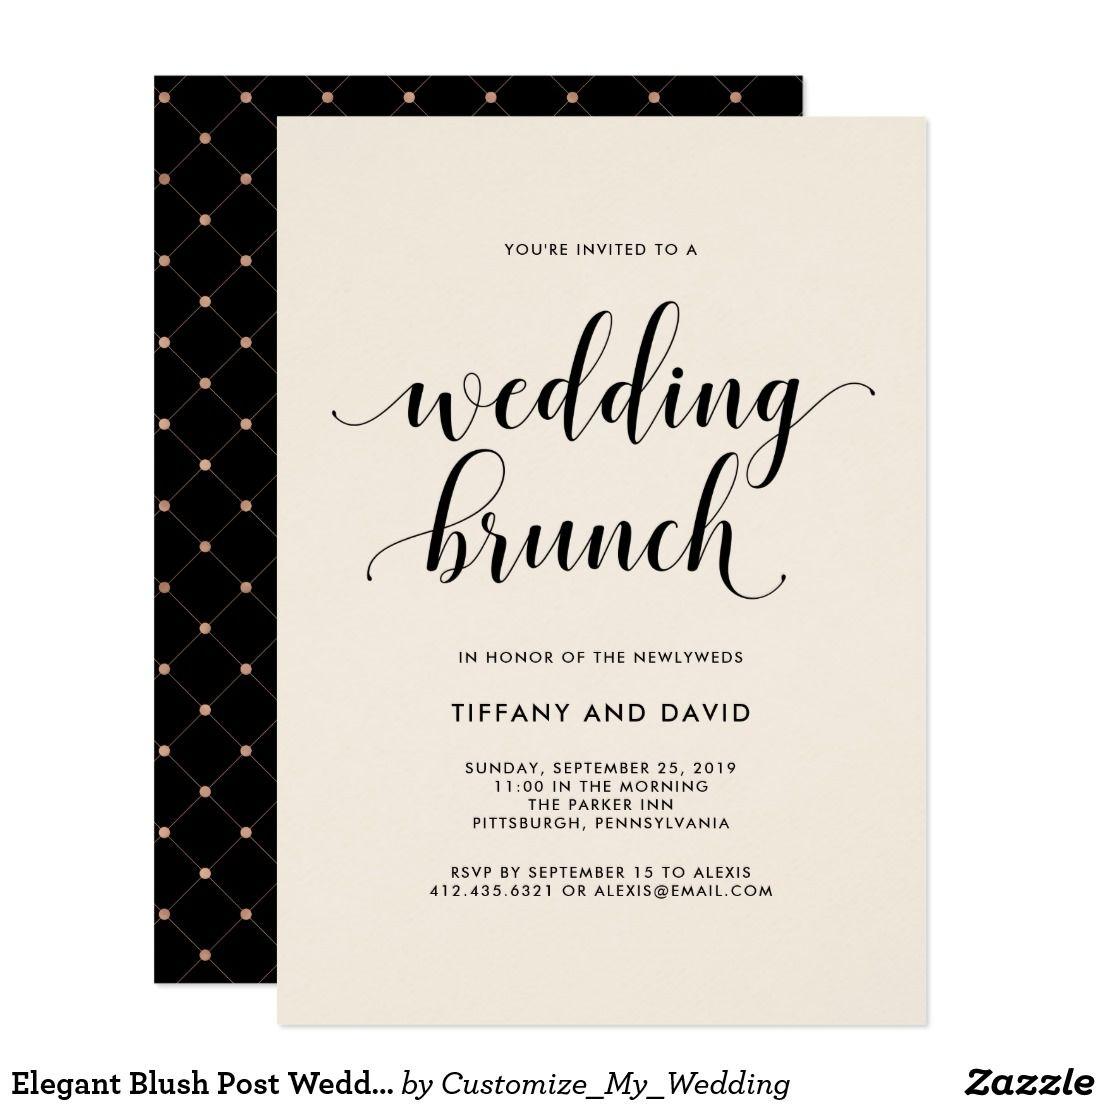 Elegant Blush Post Wedding Brunch Invitation This Elegant And Chic